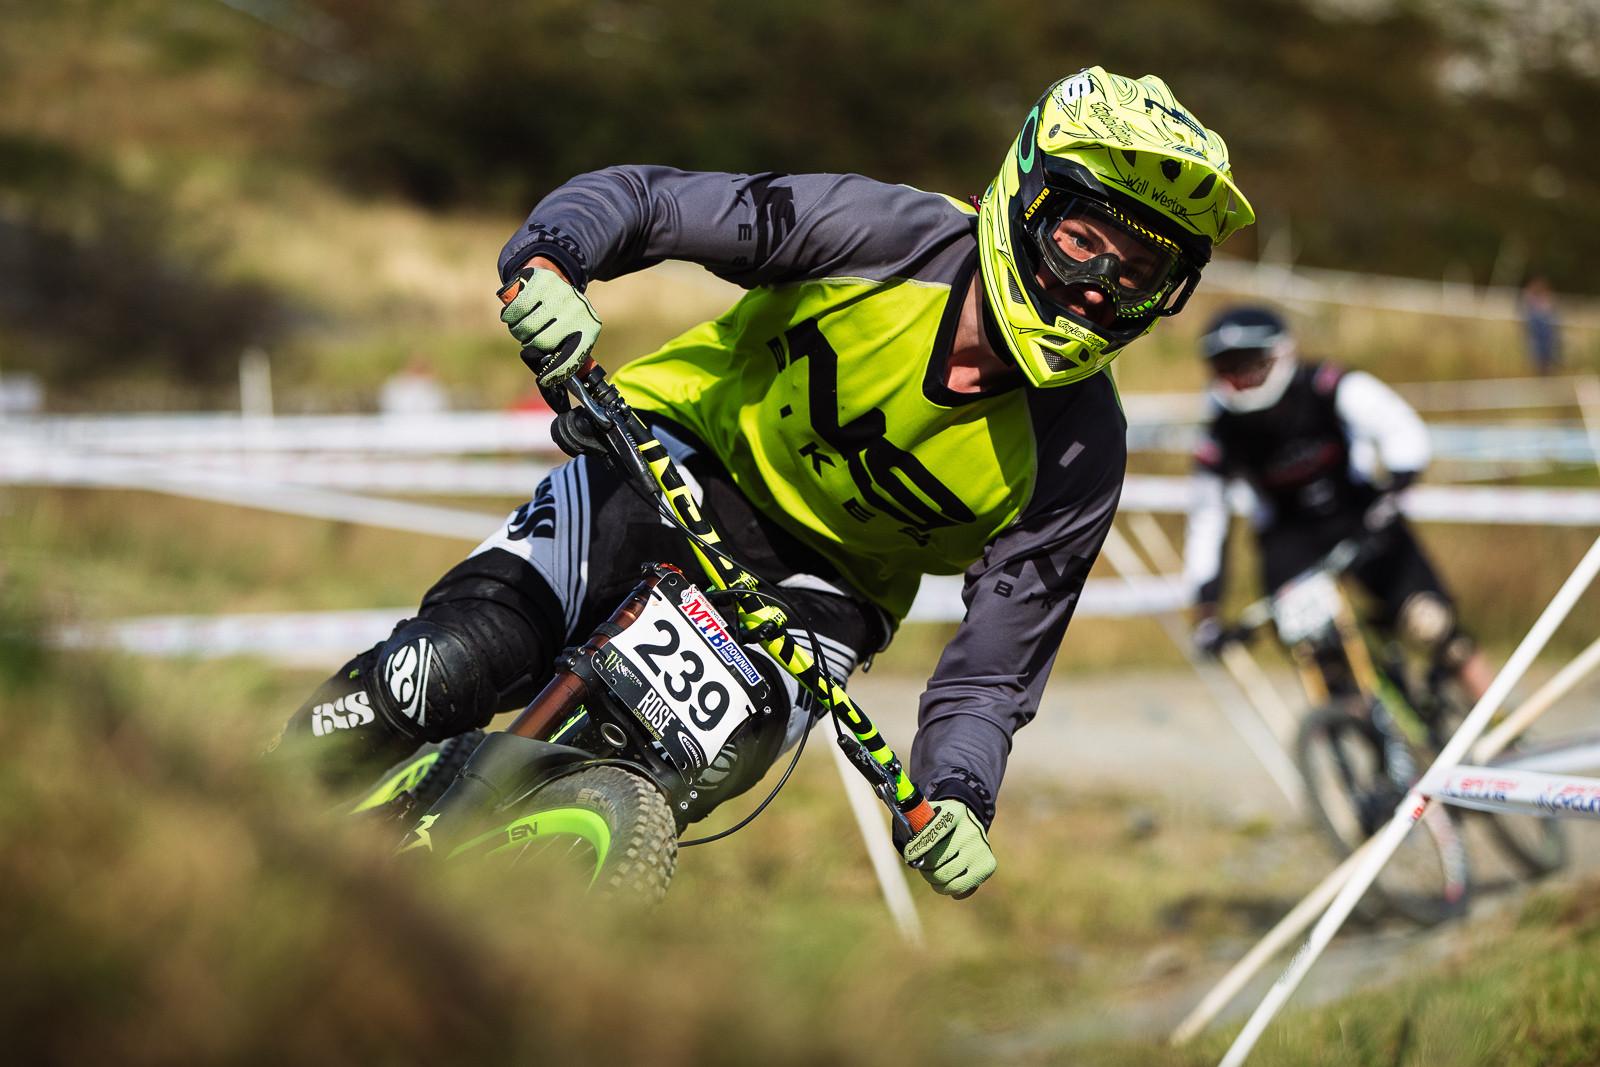 Will Weston, 2015 British Downhill Series Finals, Antur Stiniog - 2015 British Downhill Series Finals - Mountain Biking Pictures - Vital MTB